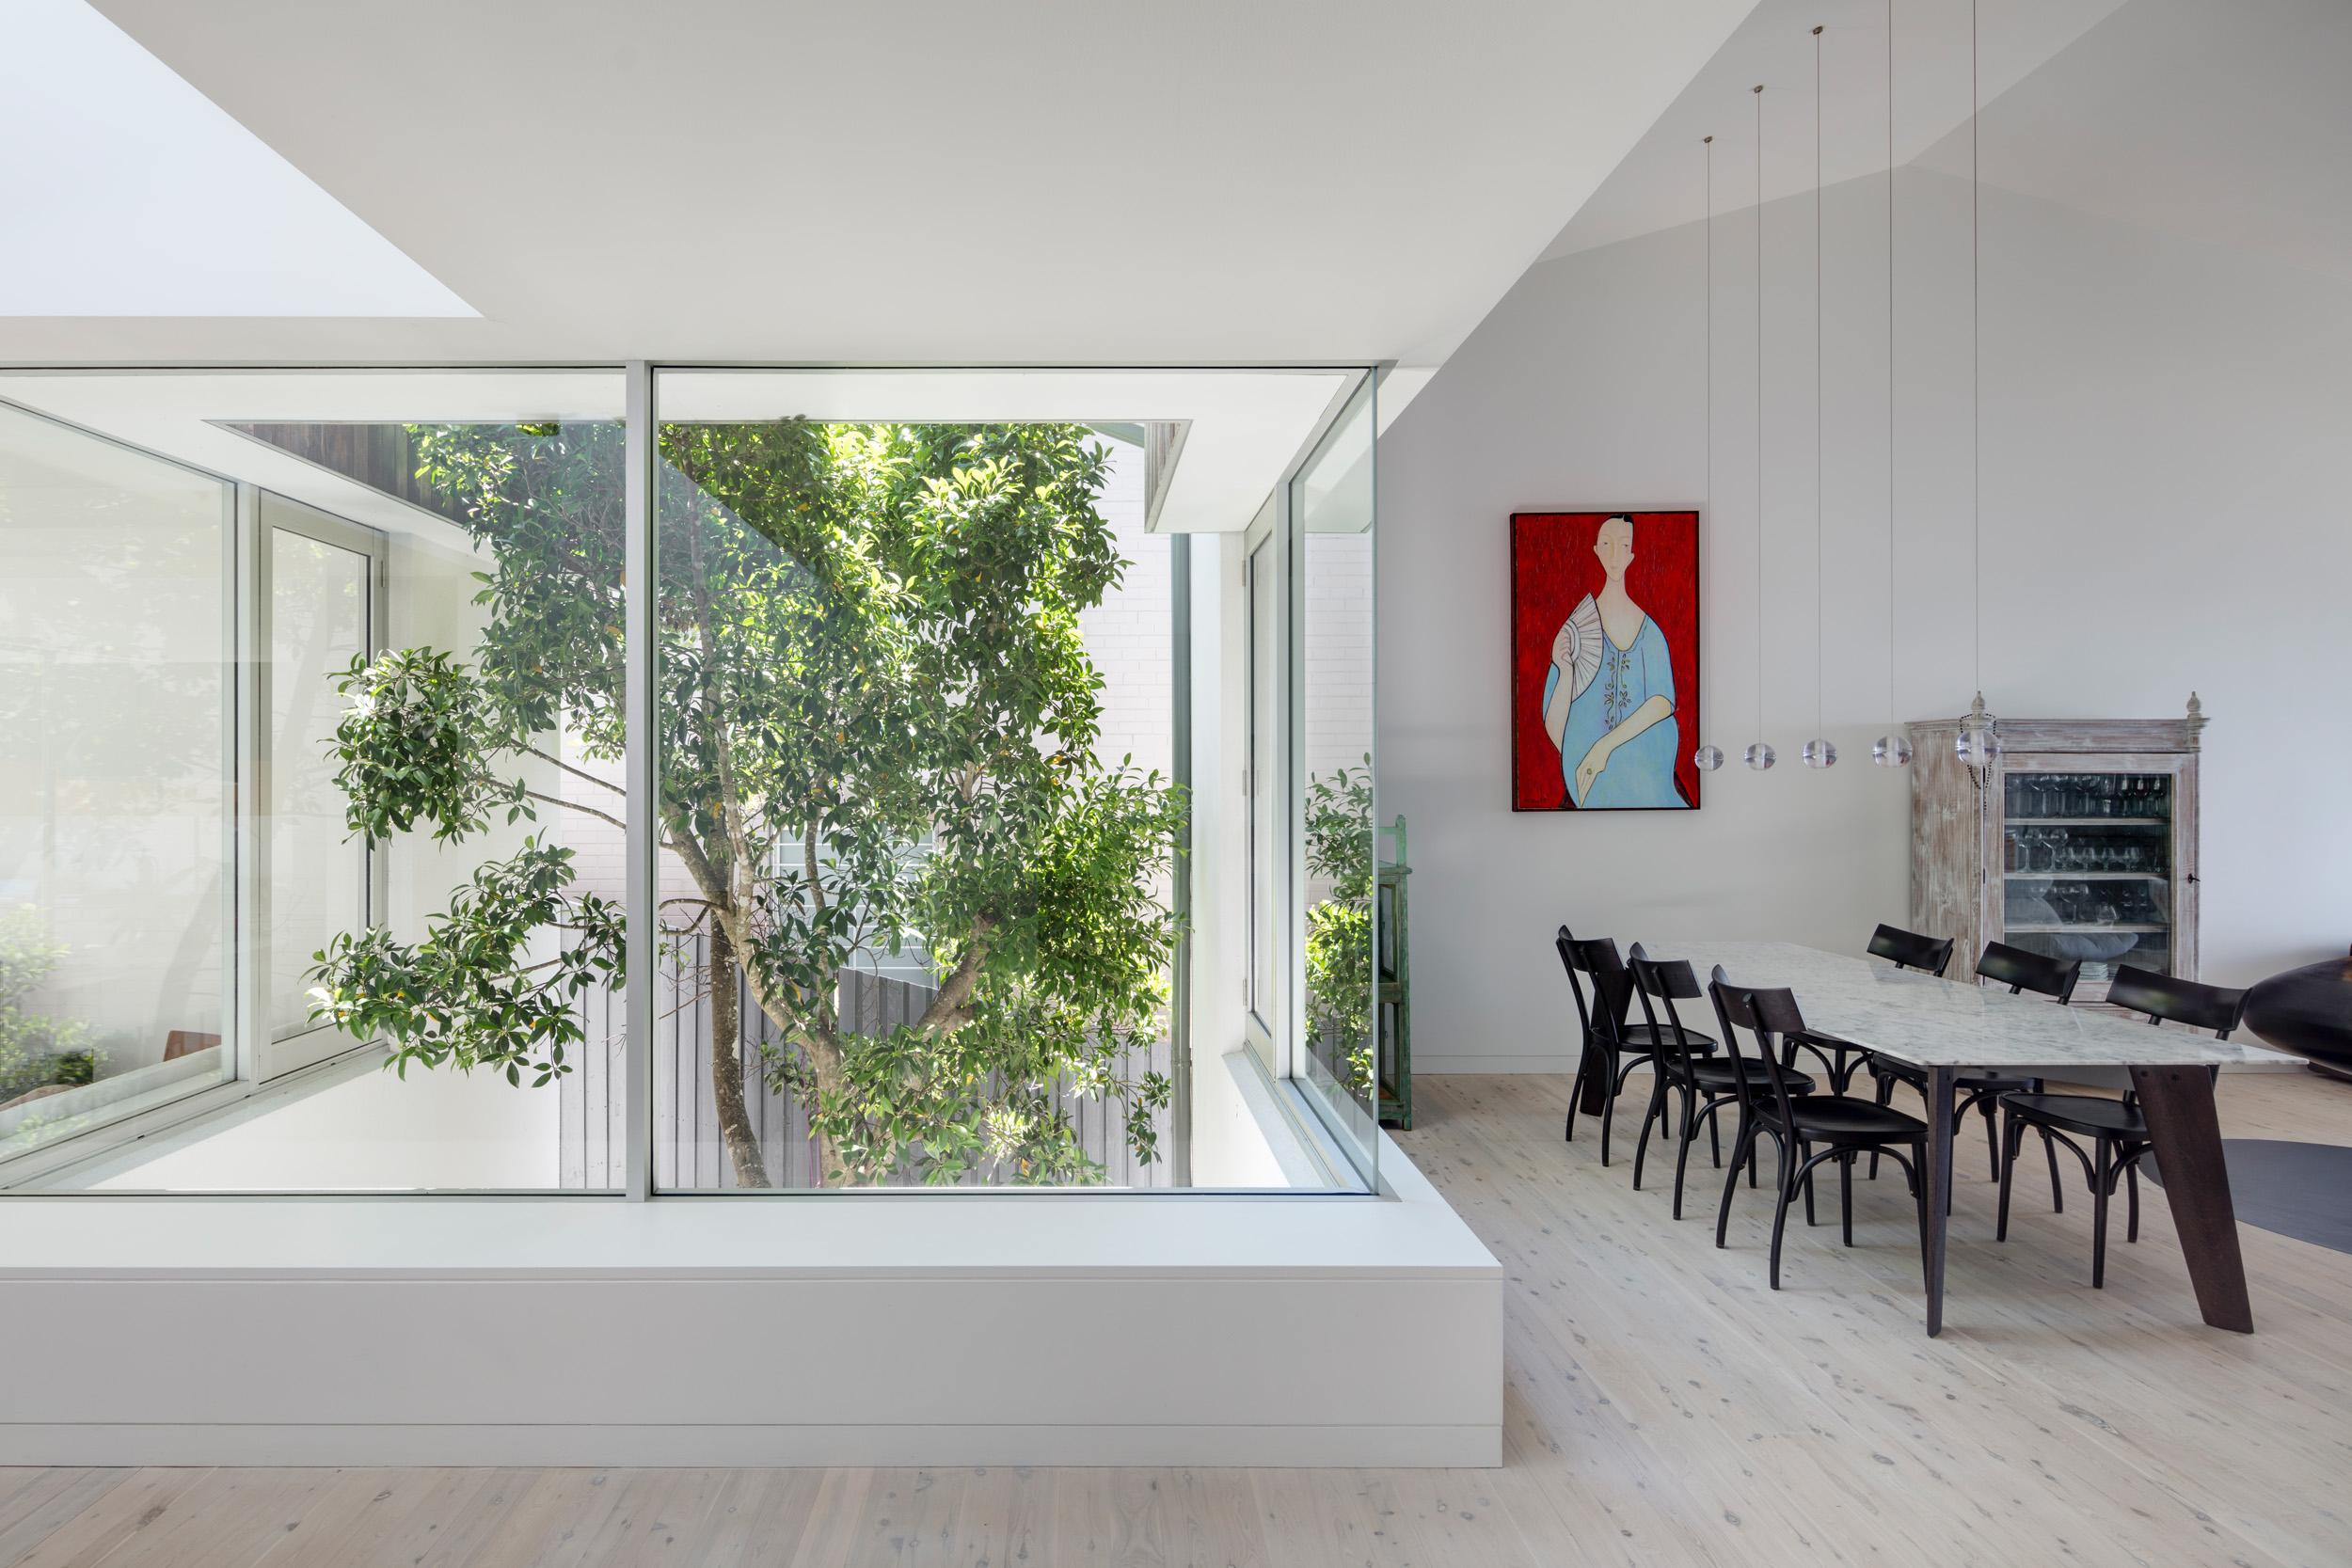 Jem_Cresswell_Architecture_Residential_Photographer_Sydney_Australia_012.jpg